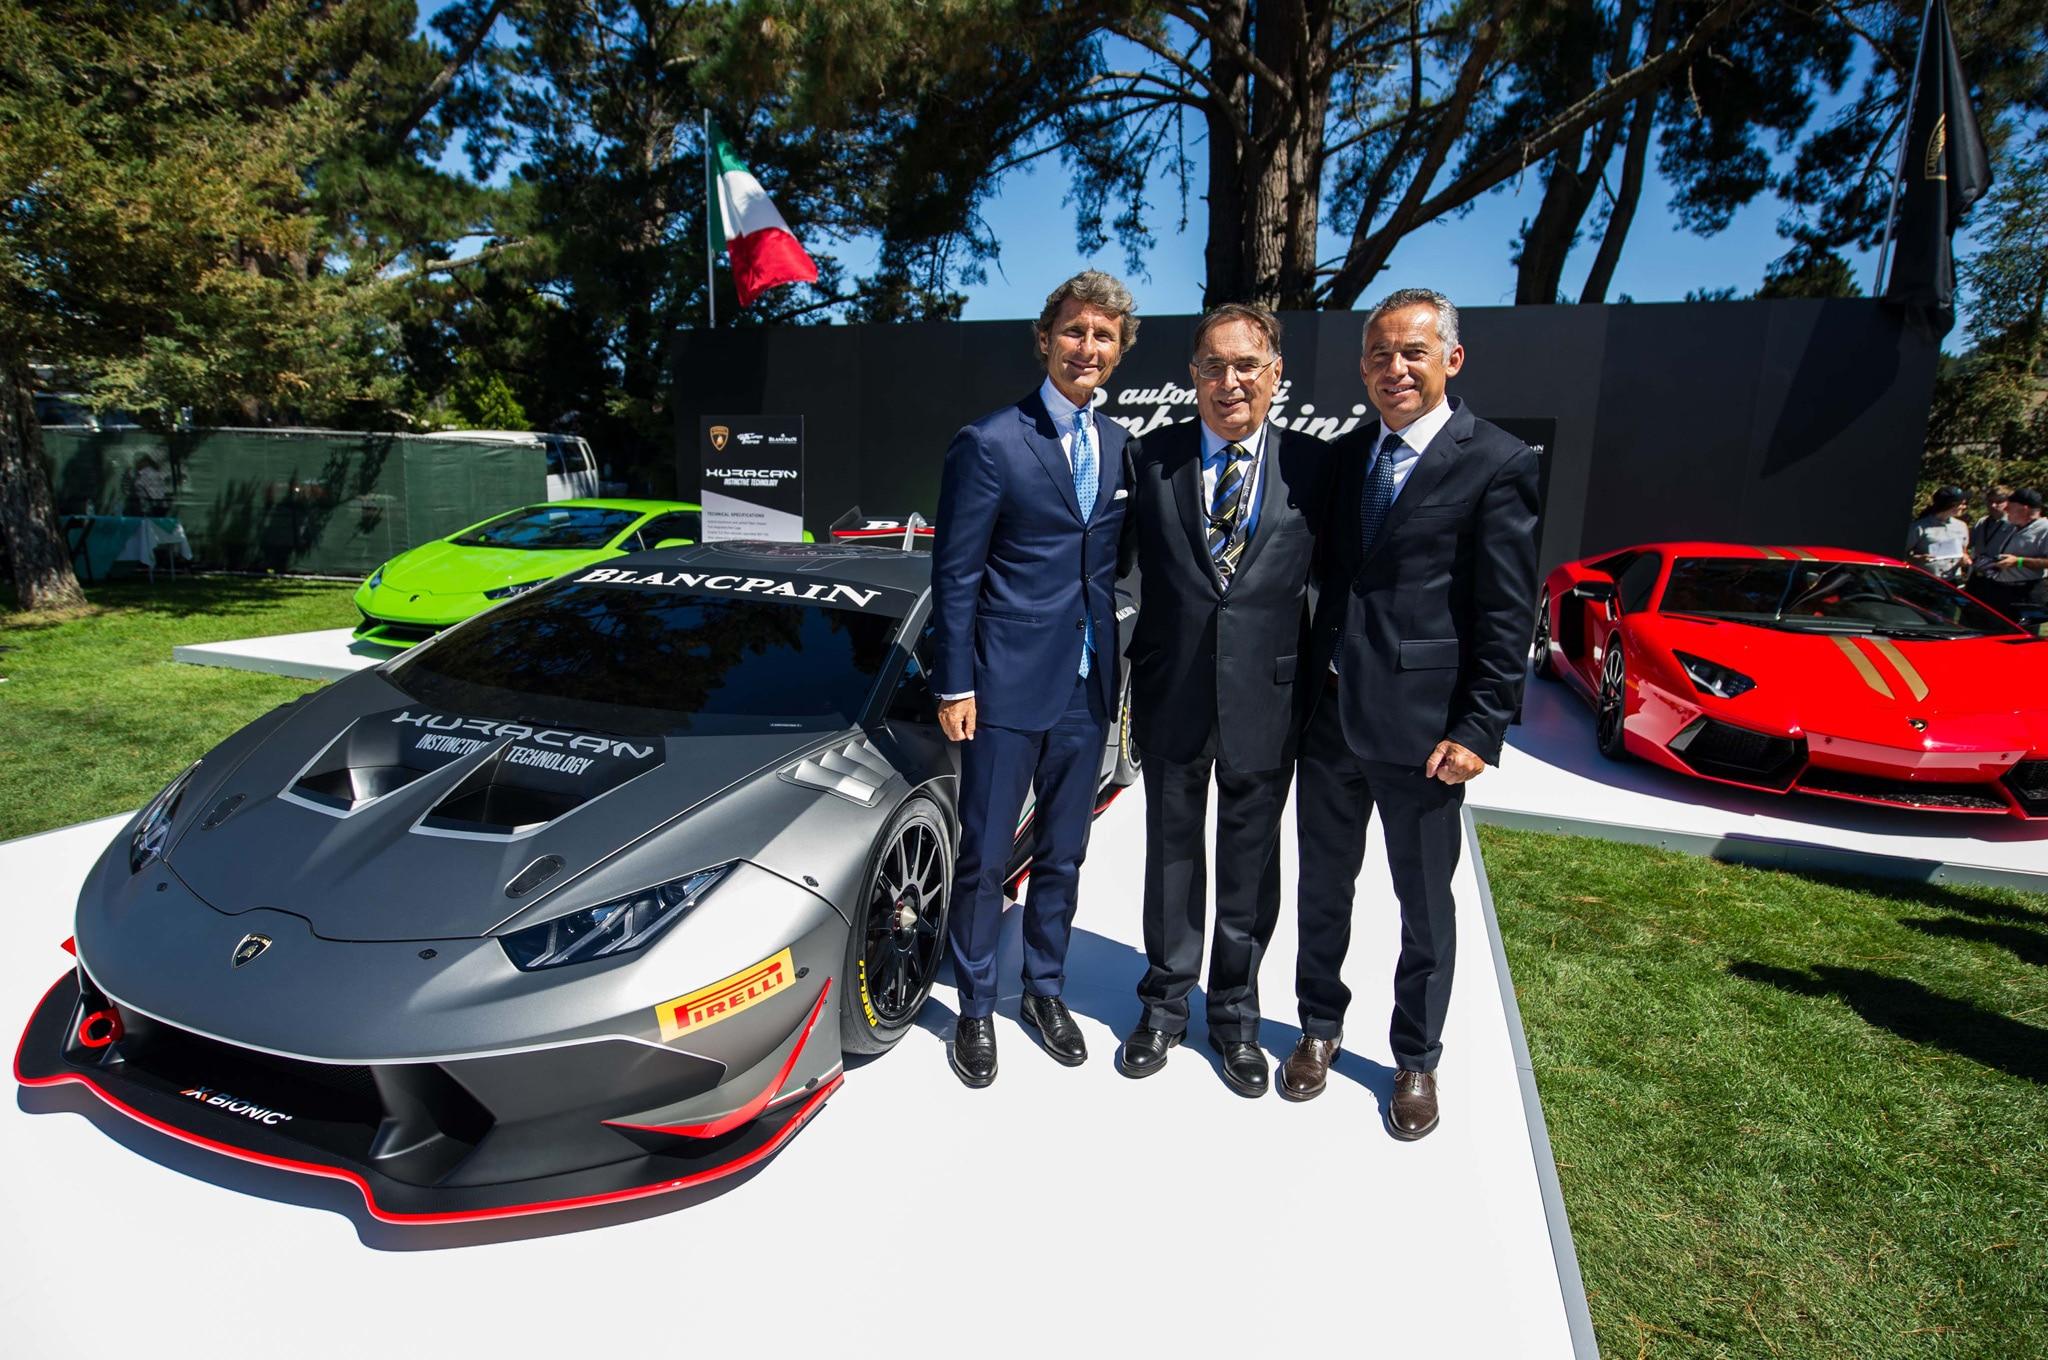 Lamborghini Huracan LP 620 2 Super Trofeo With Stephan Winkelmann Giampaolo Dallara Maurizio Reggiani